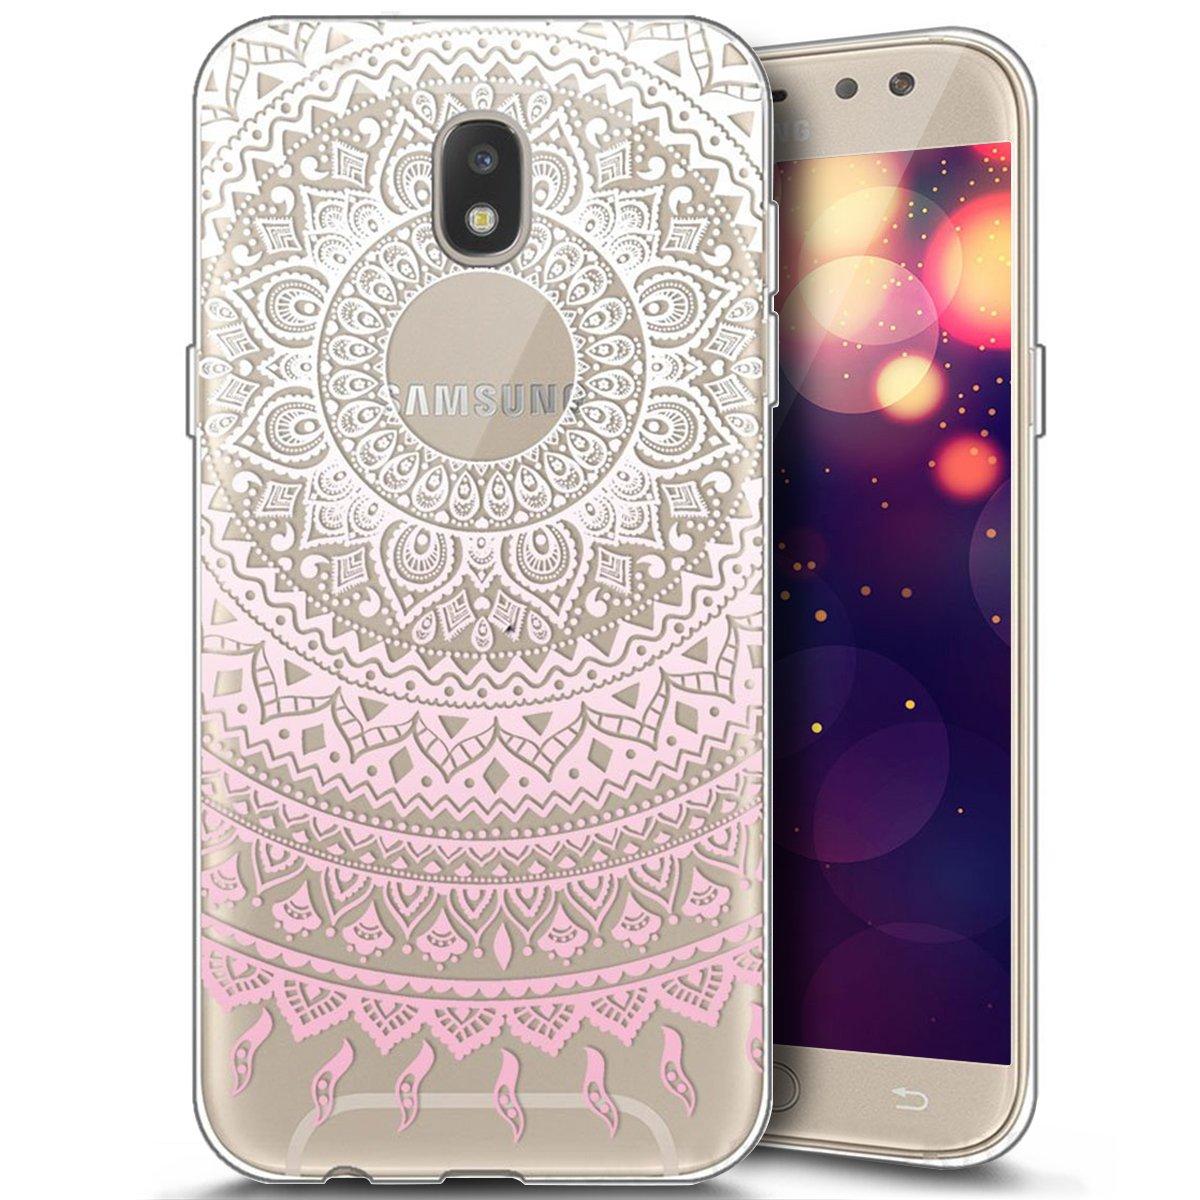 Galaxy J3 2017 Hü lle, JAWSEU Schwarz Mandala Blumen Muster Ultra Dü nn Transparent Handyhü lle Silikon Rü ckseite Schutzhü lle Durchsichtige TPU Bumper Backcover Tasche Etui Fü r Samsung Galaxy J3 2017